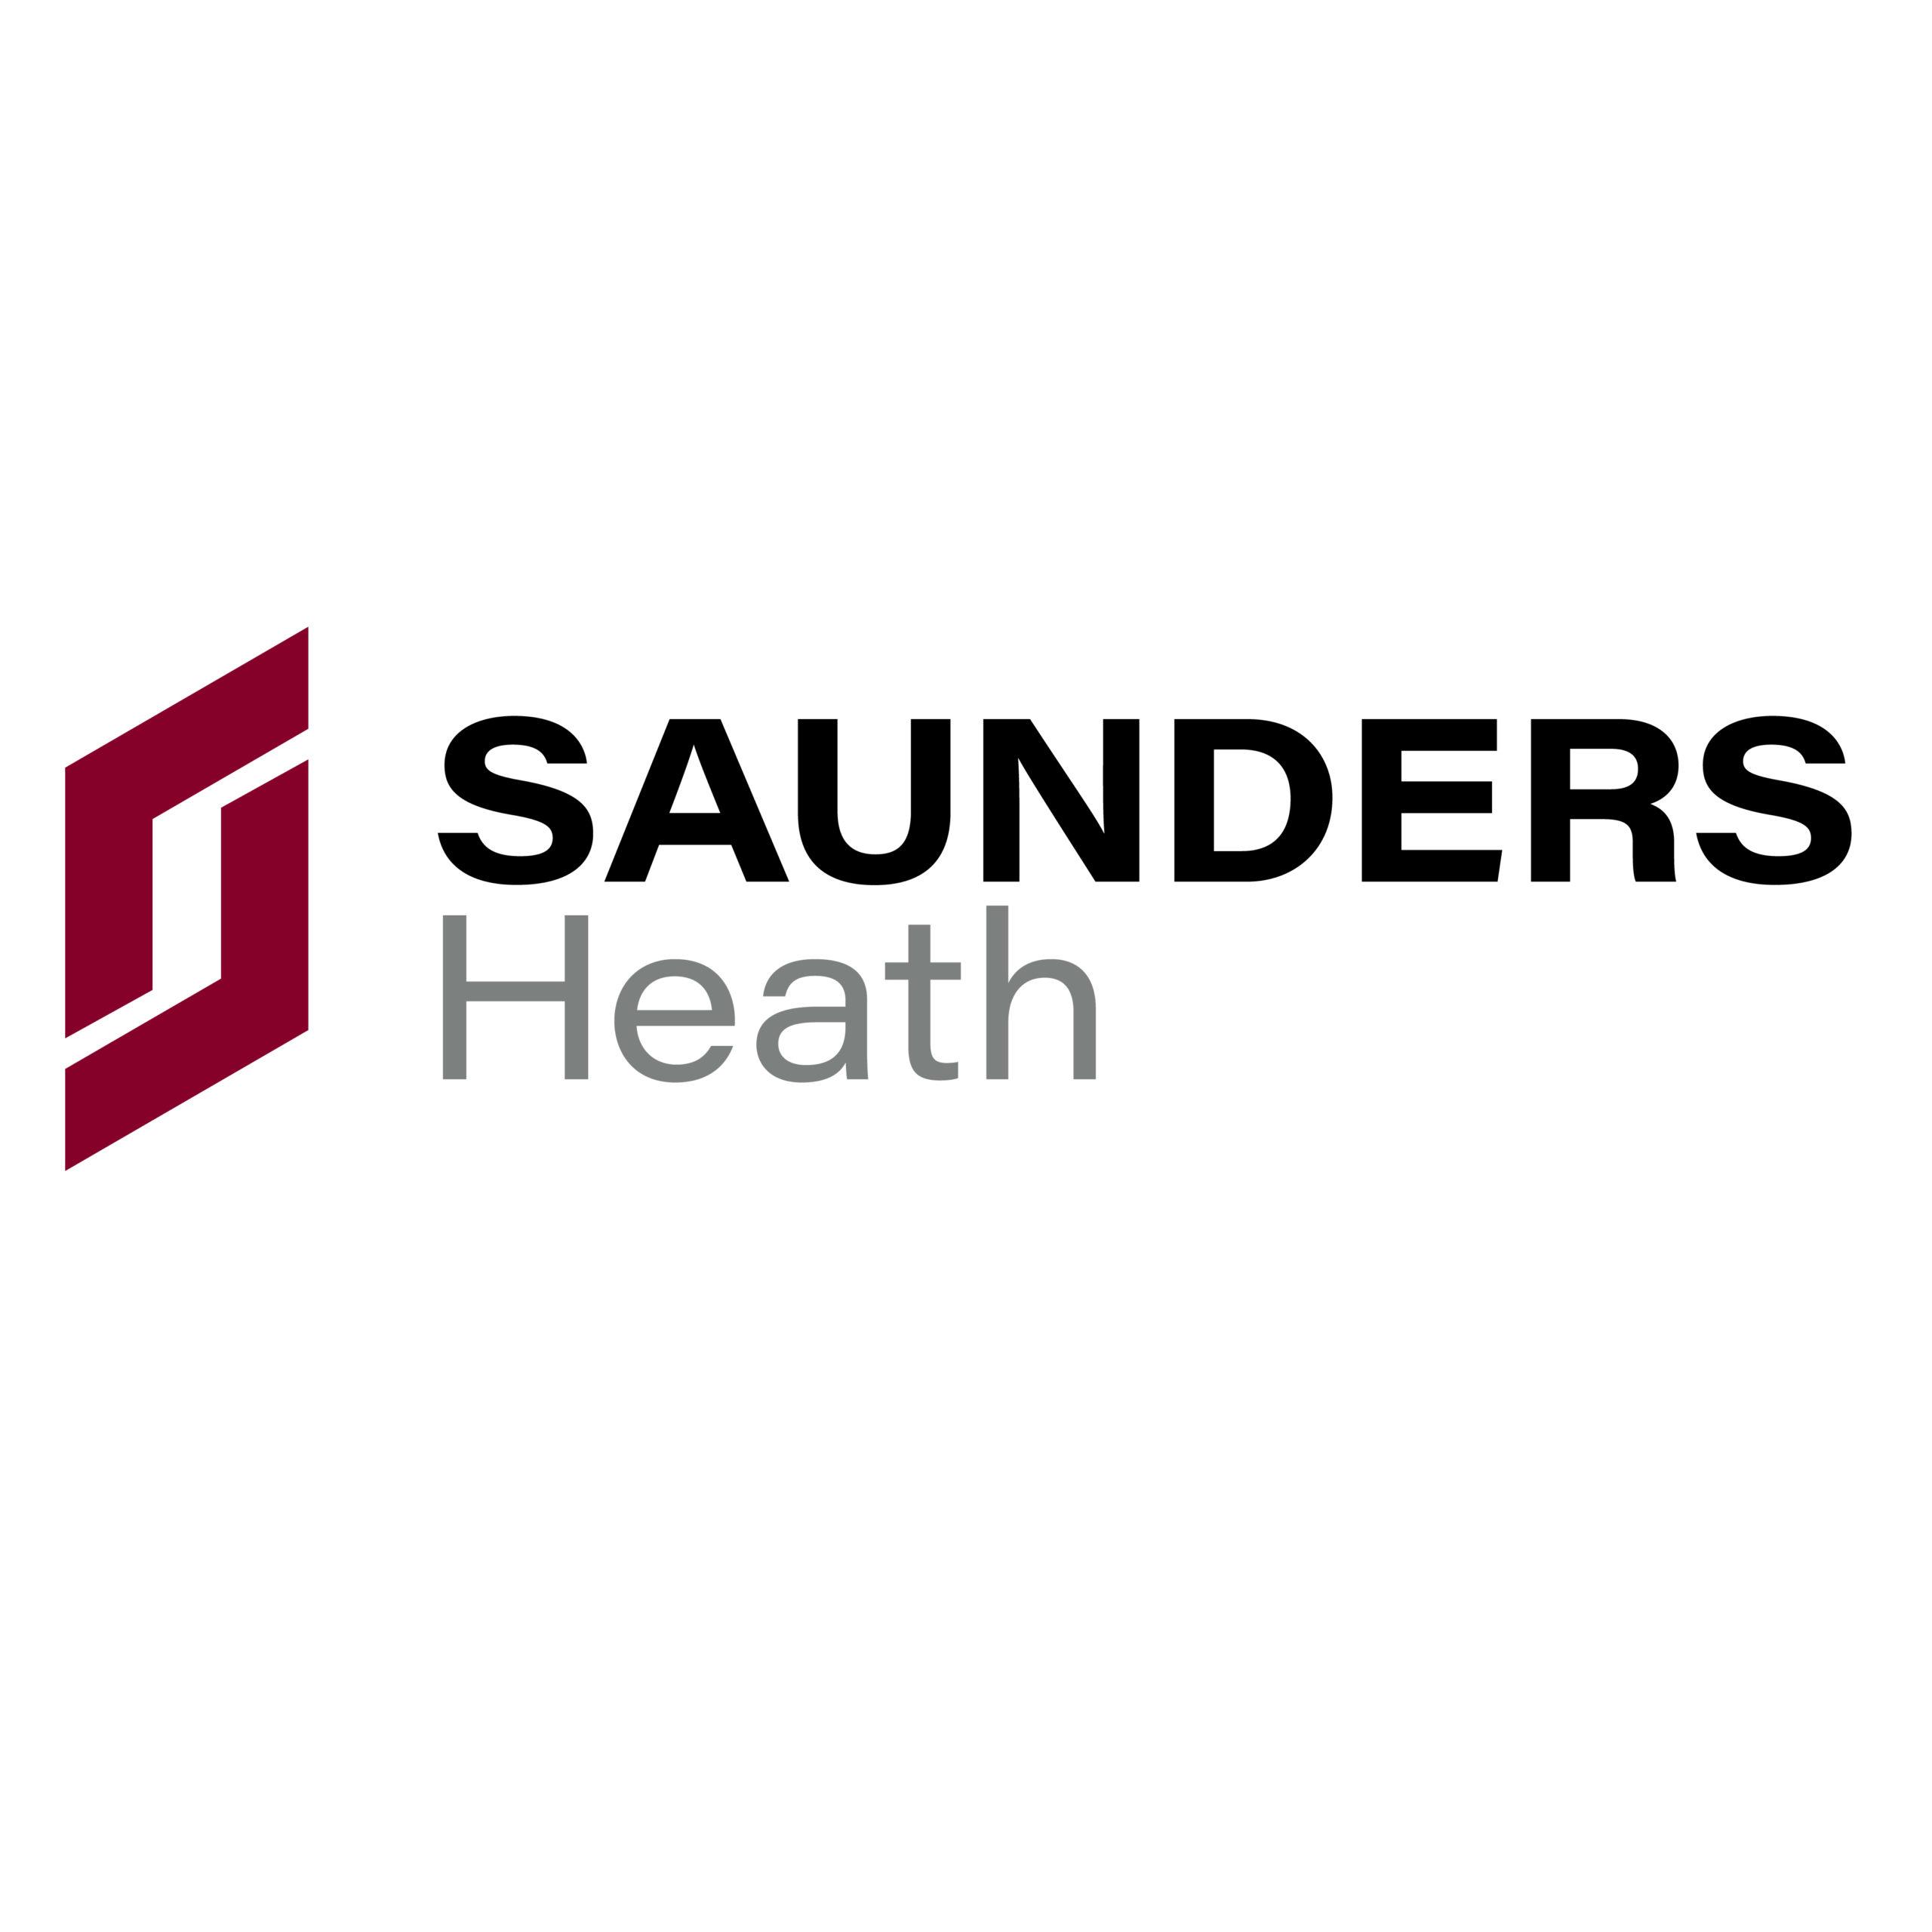 Saunders-Heath-Horiz square